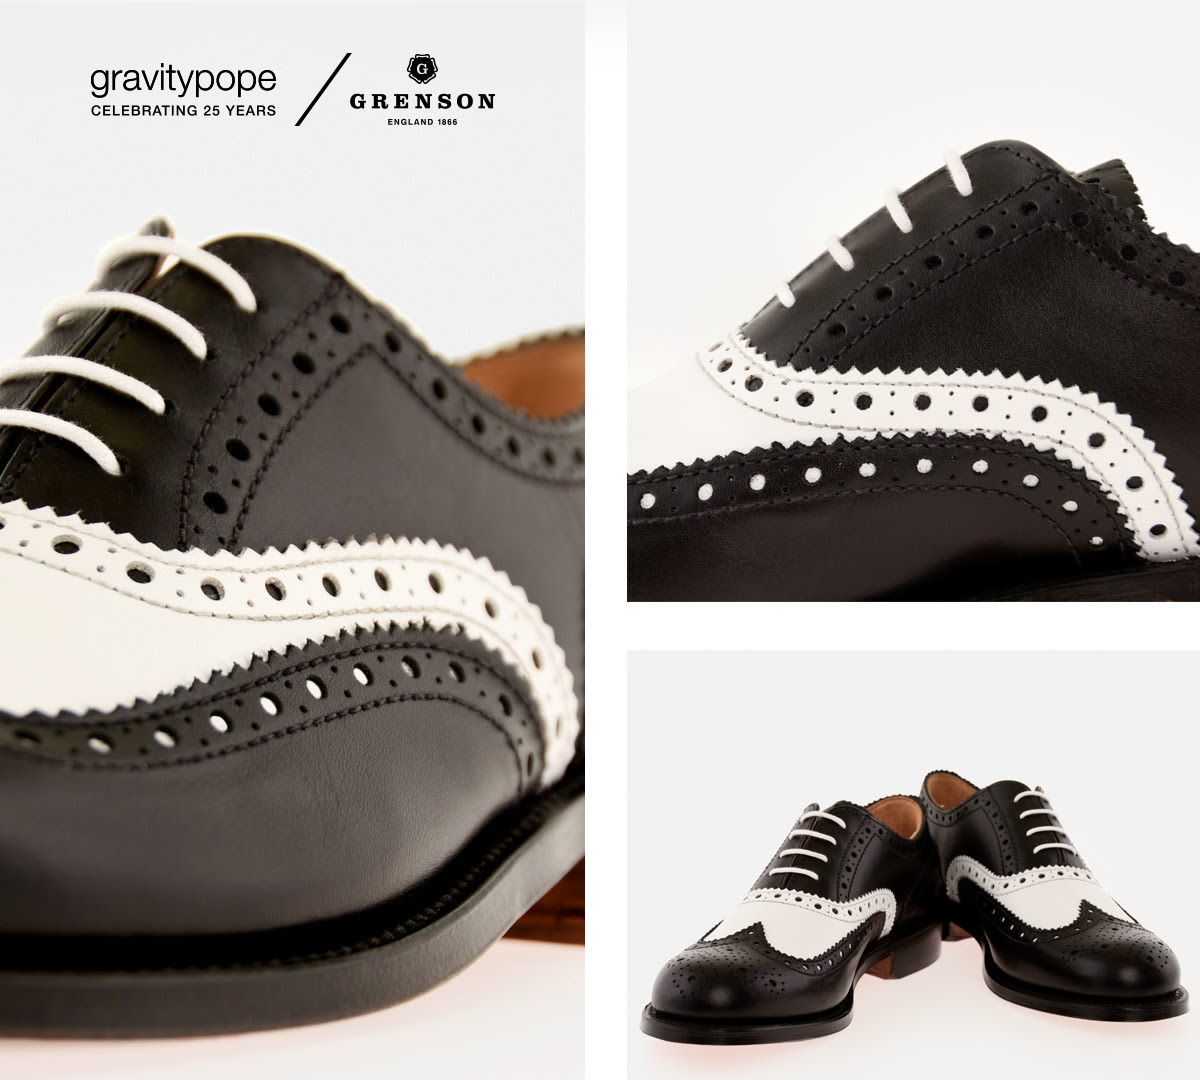 GRAVITYPOPE X GRENSON